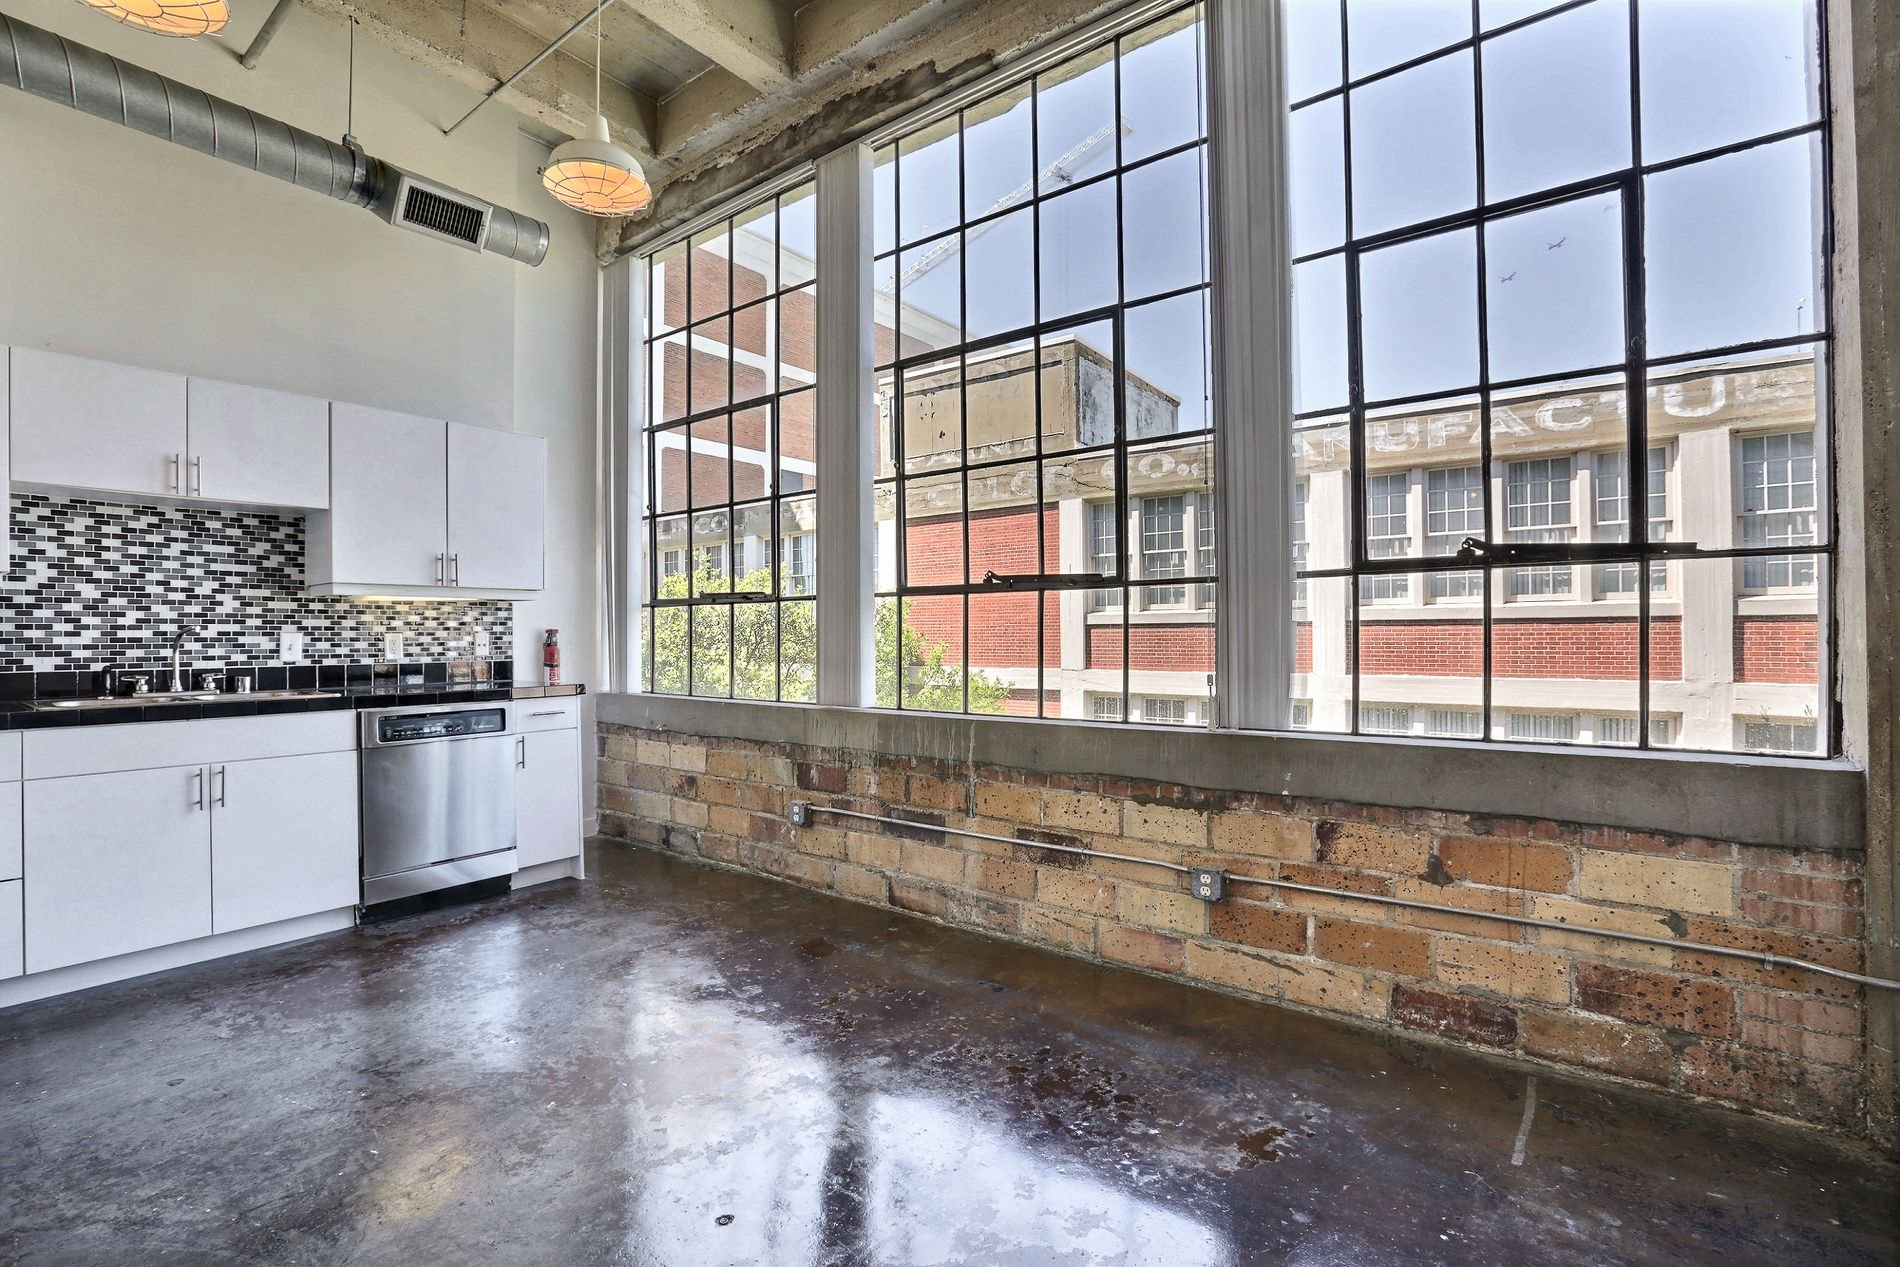 Photos And Video Of Deep Ellum Lofts In Dallas Tx